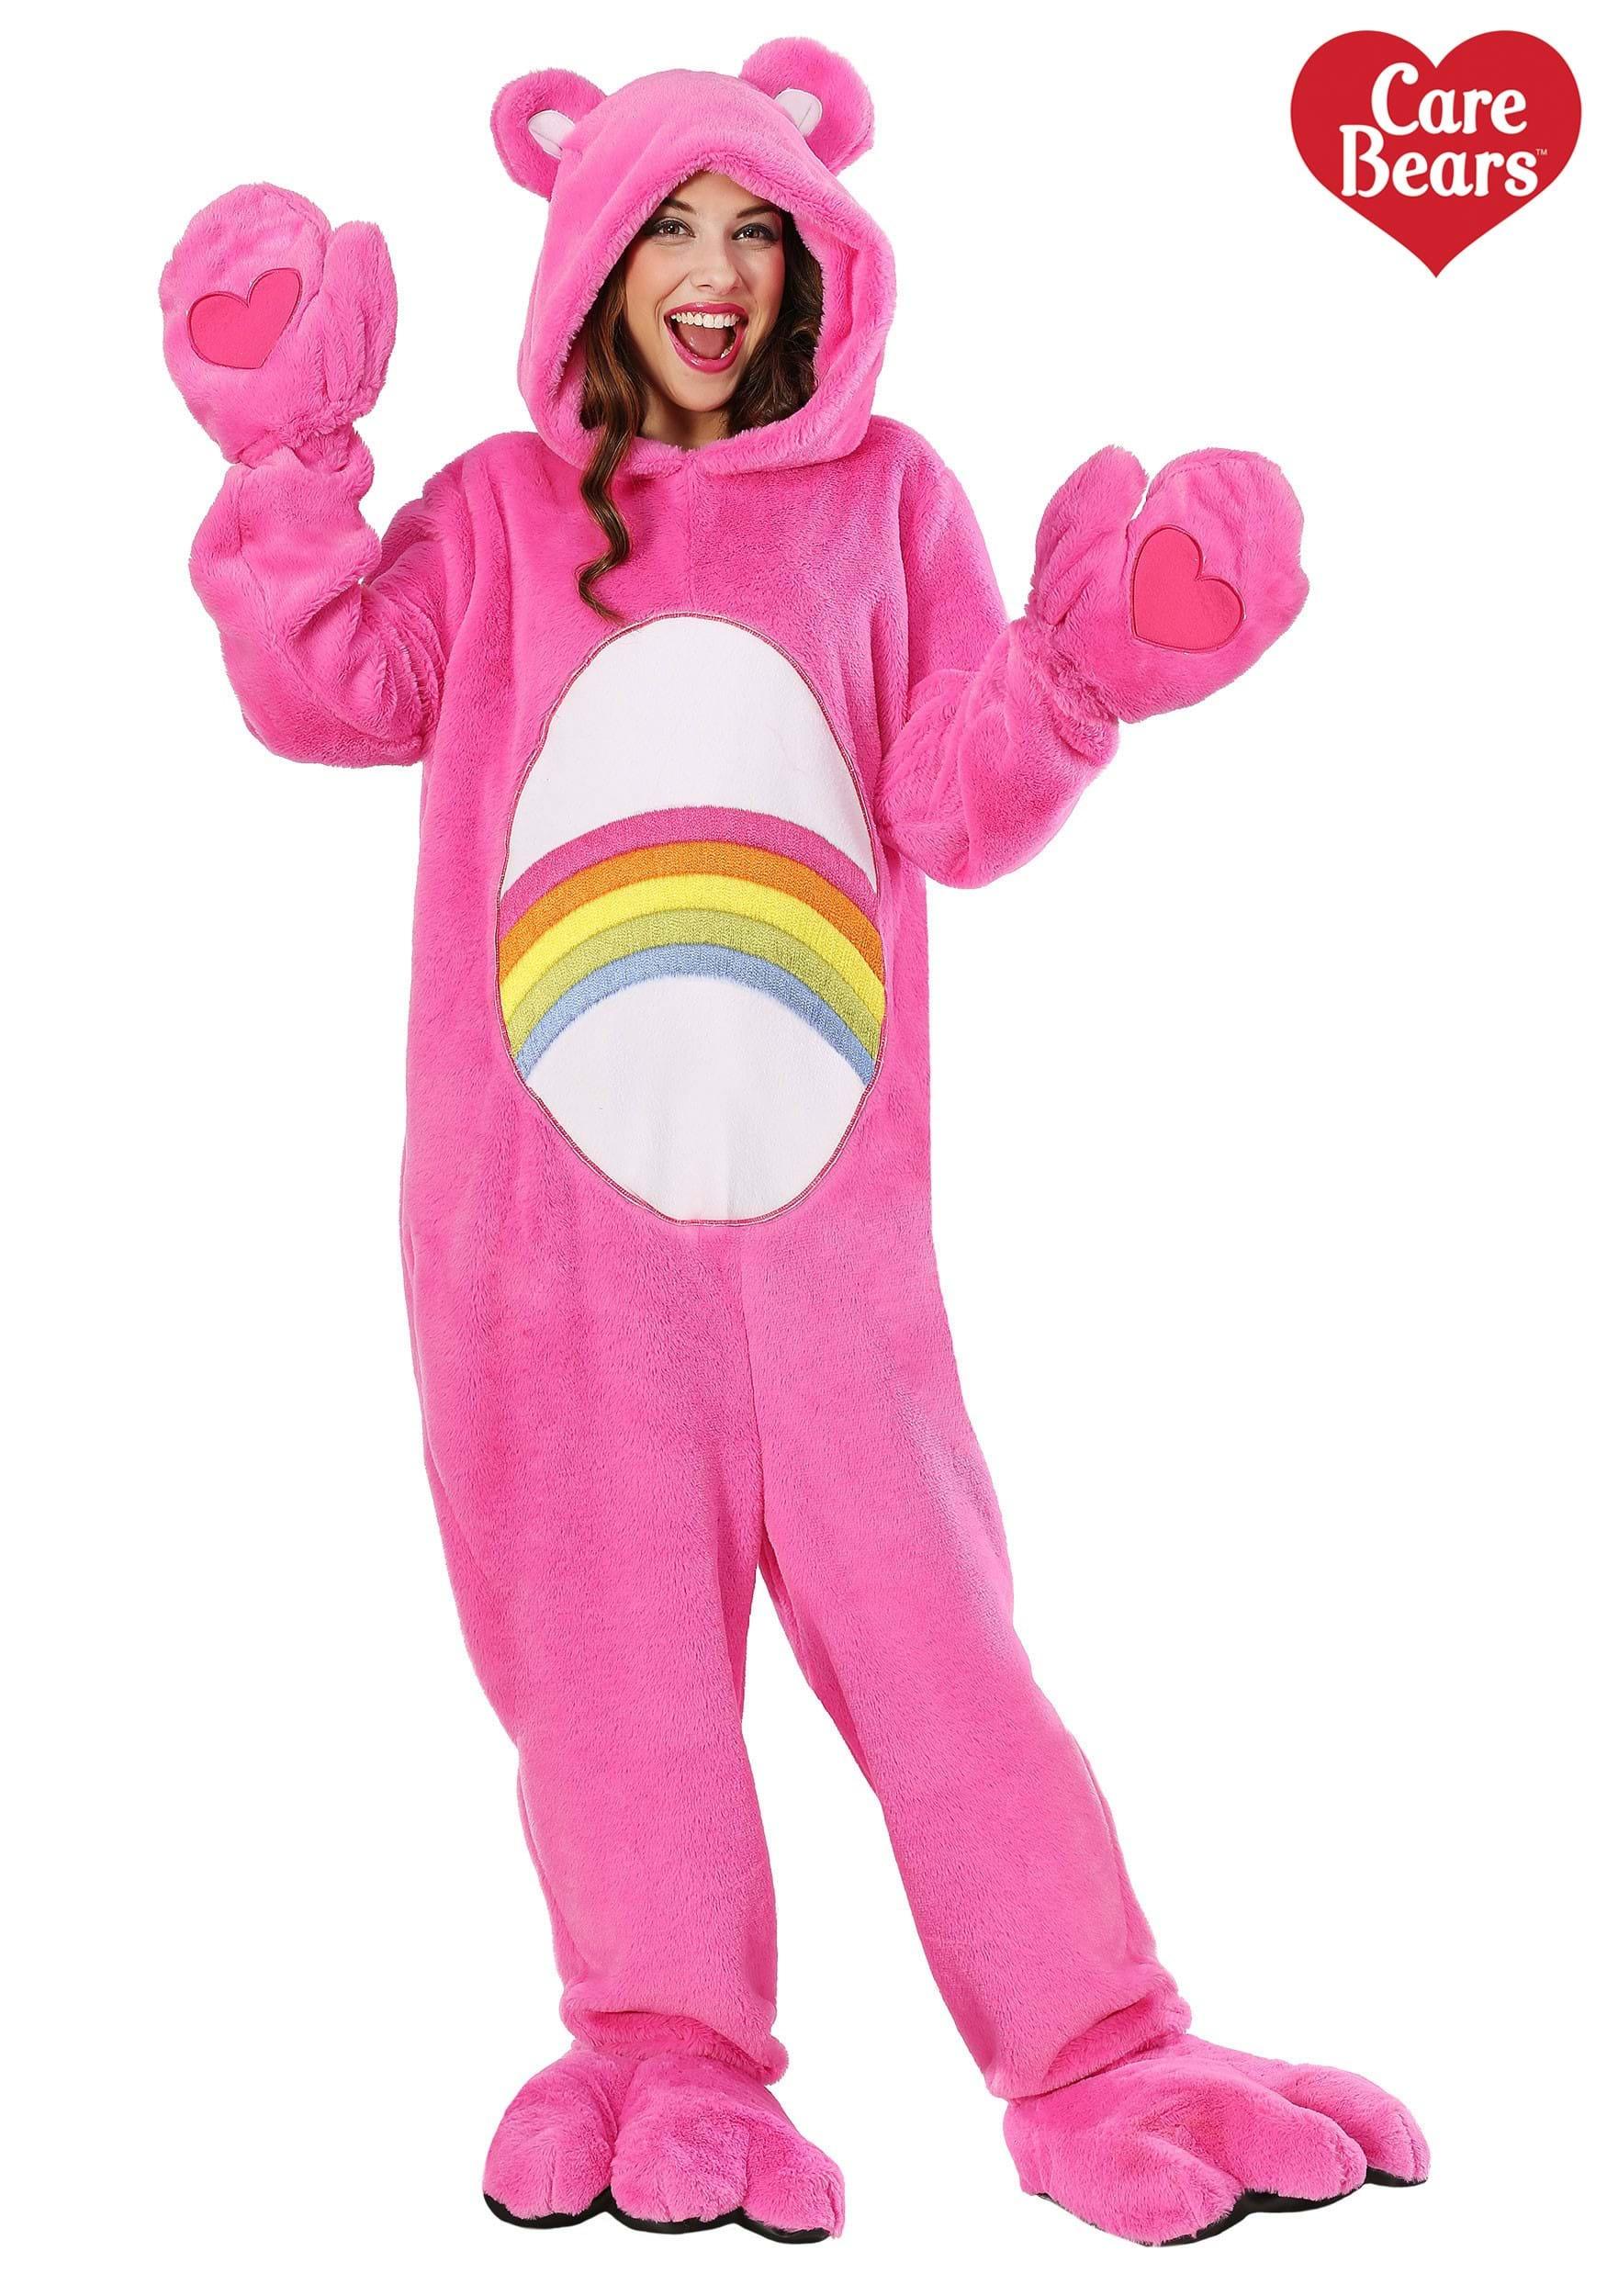 Halloween Costumes Care Bears